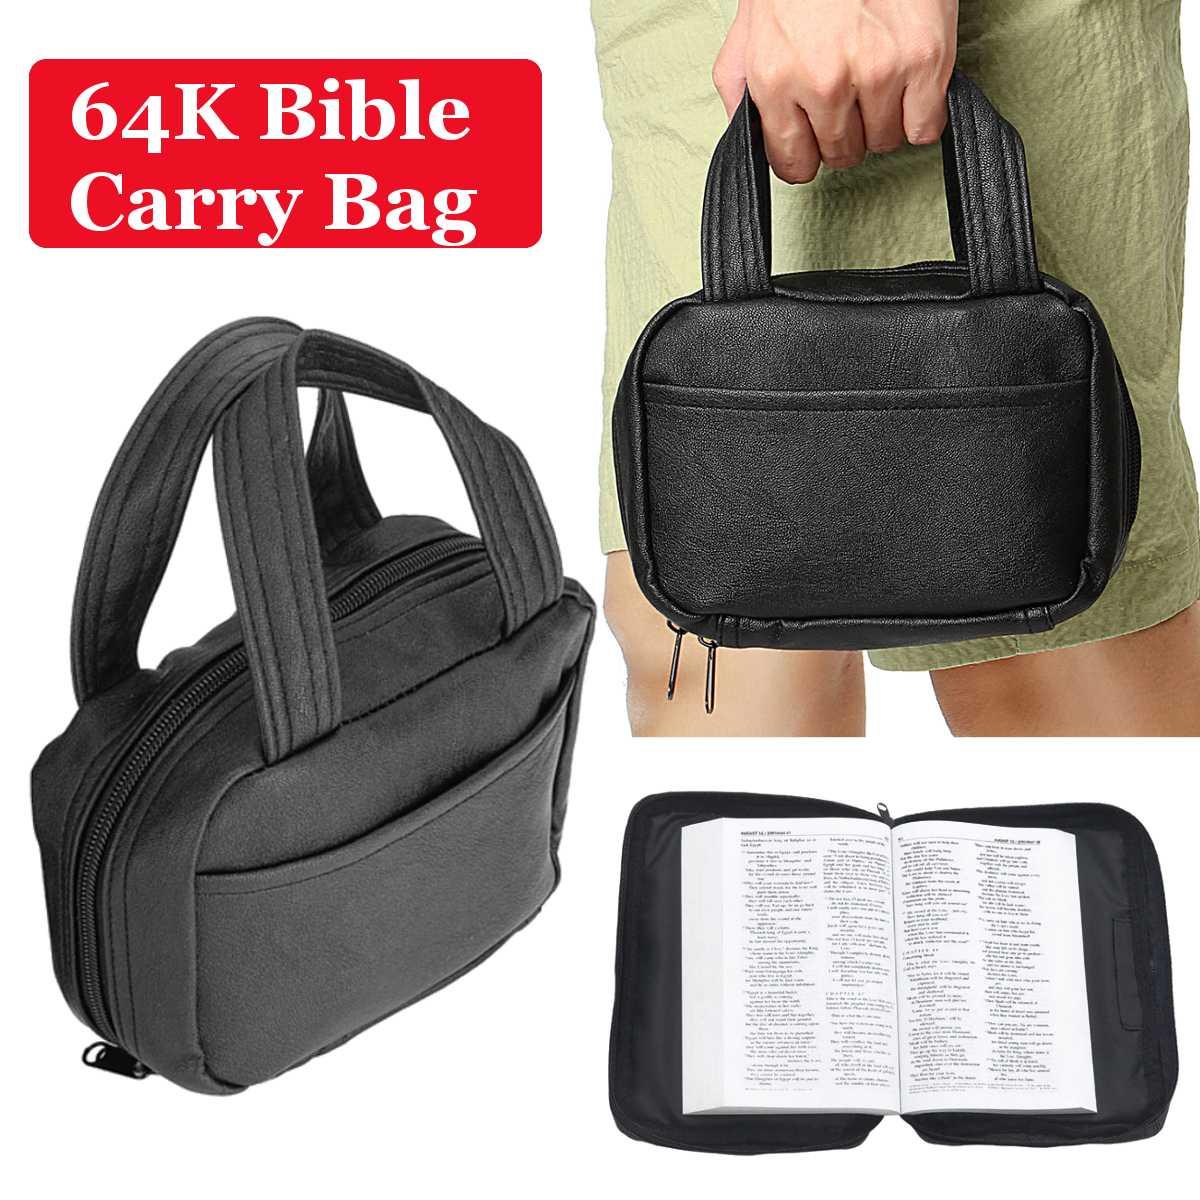 Black Genuine Leather Portable Bible Book Cover Protecter Bag For 64K Bible Book Bible Holy Carry Bag Bible Study Book Handbag